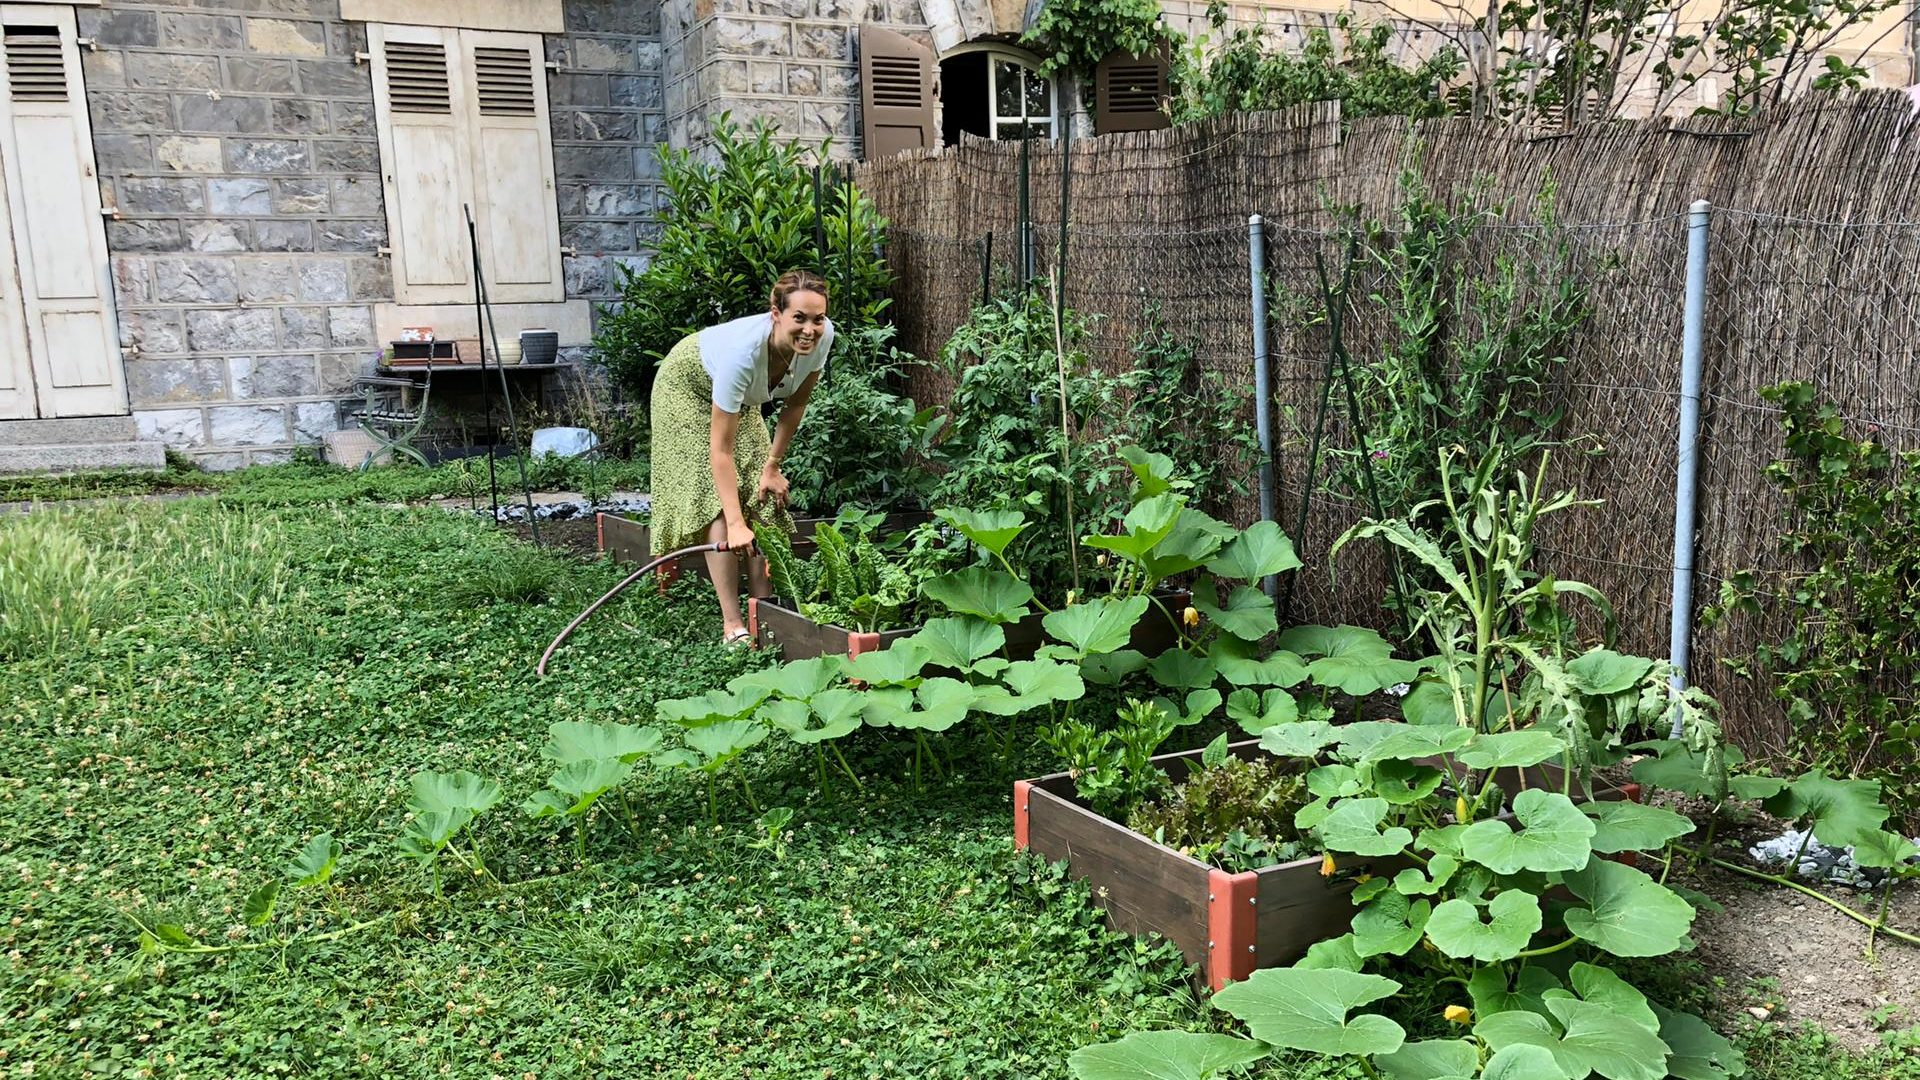 Jasmina en train de faire du jardinage